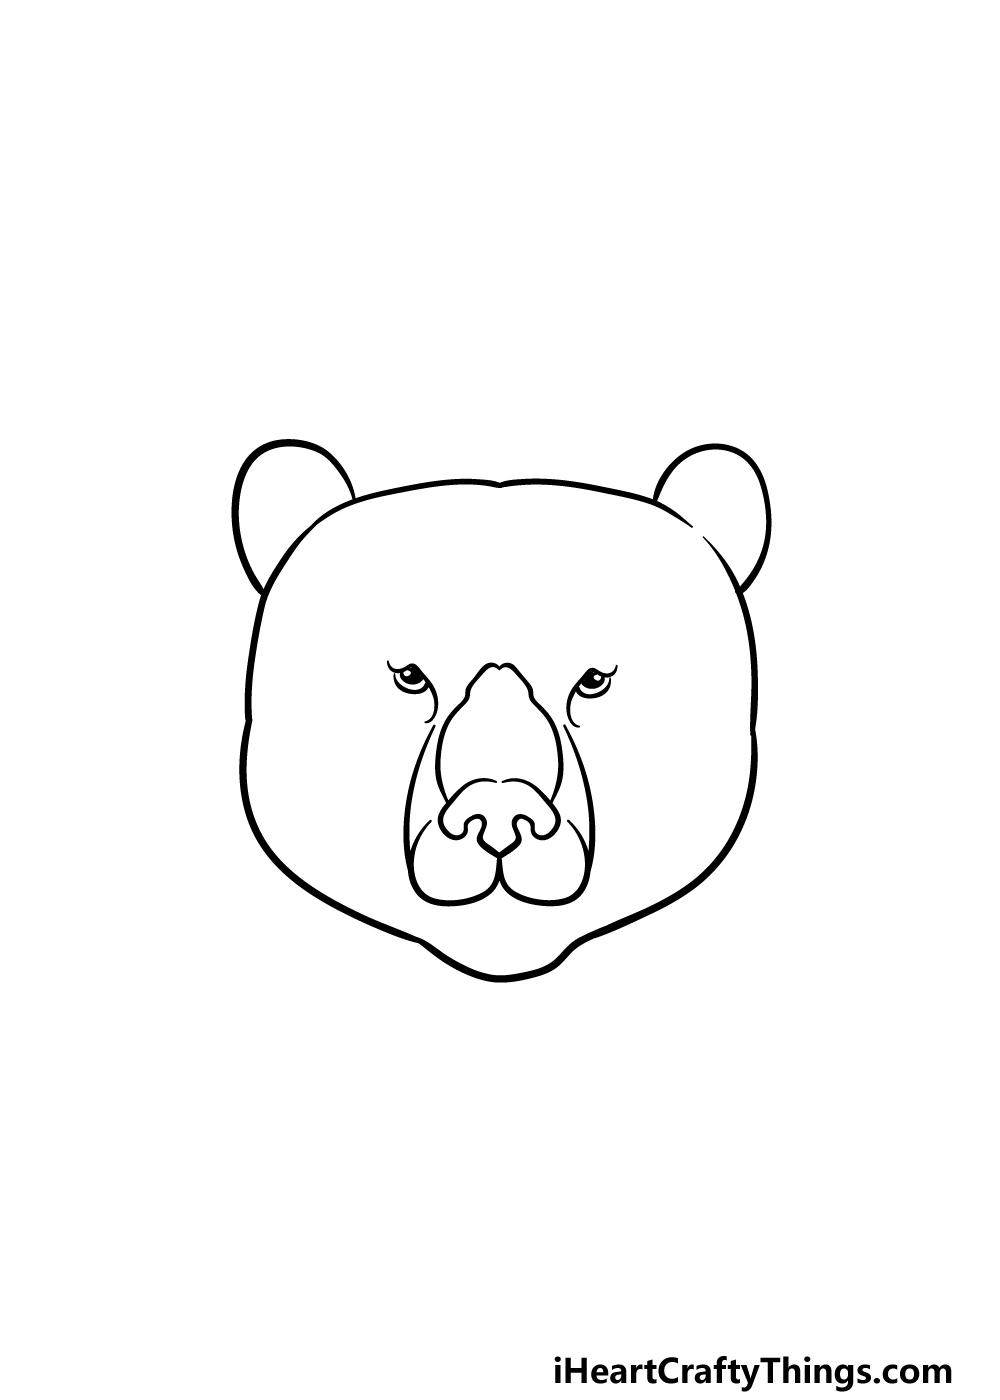 drawing a bear face step 2